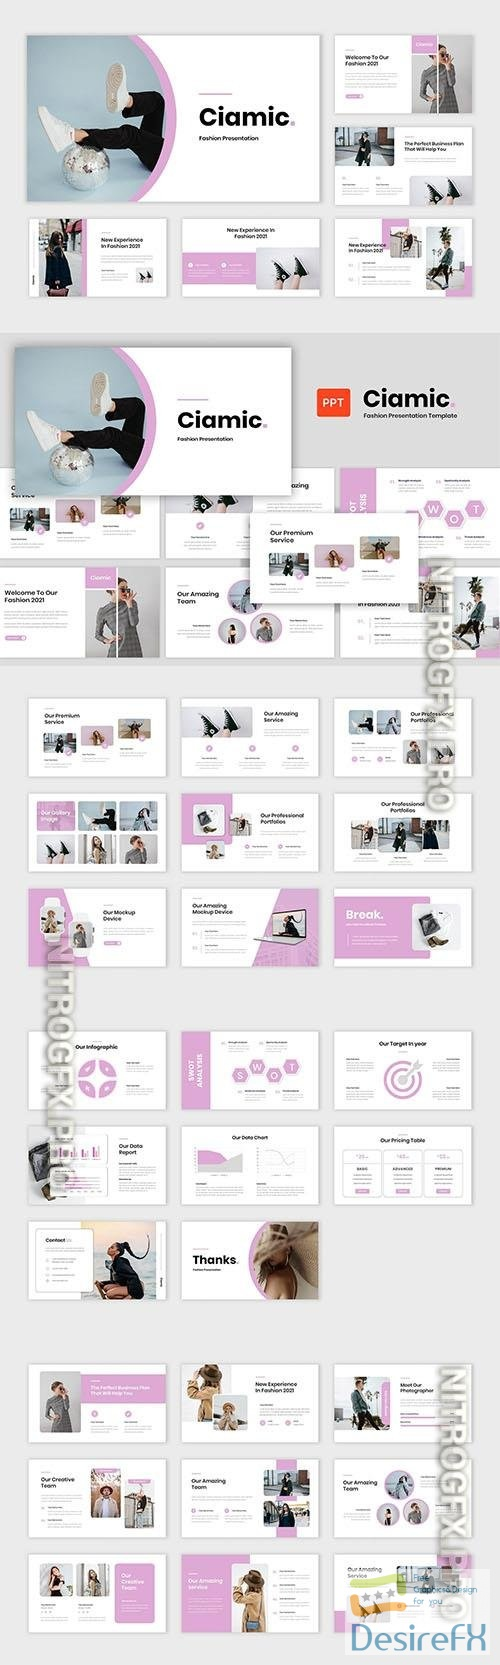 Ciamic - Fashion Presentation Powerpoint, Keynote and Google Slides